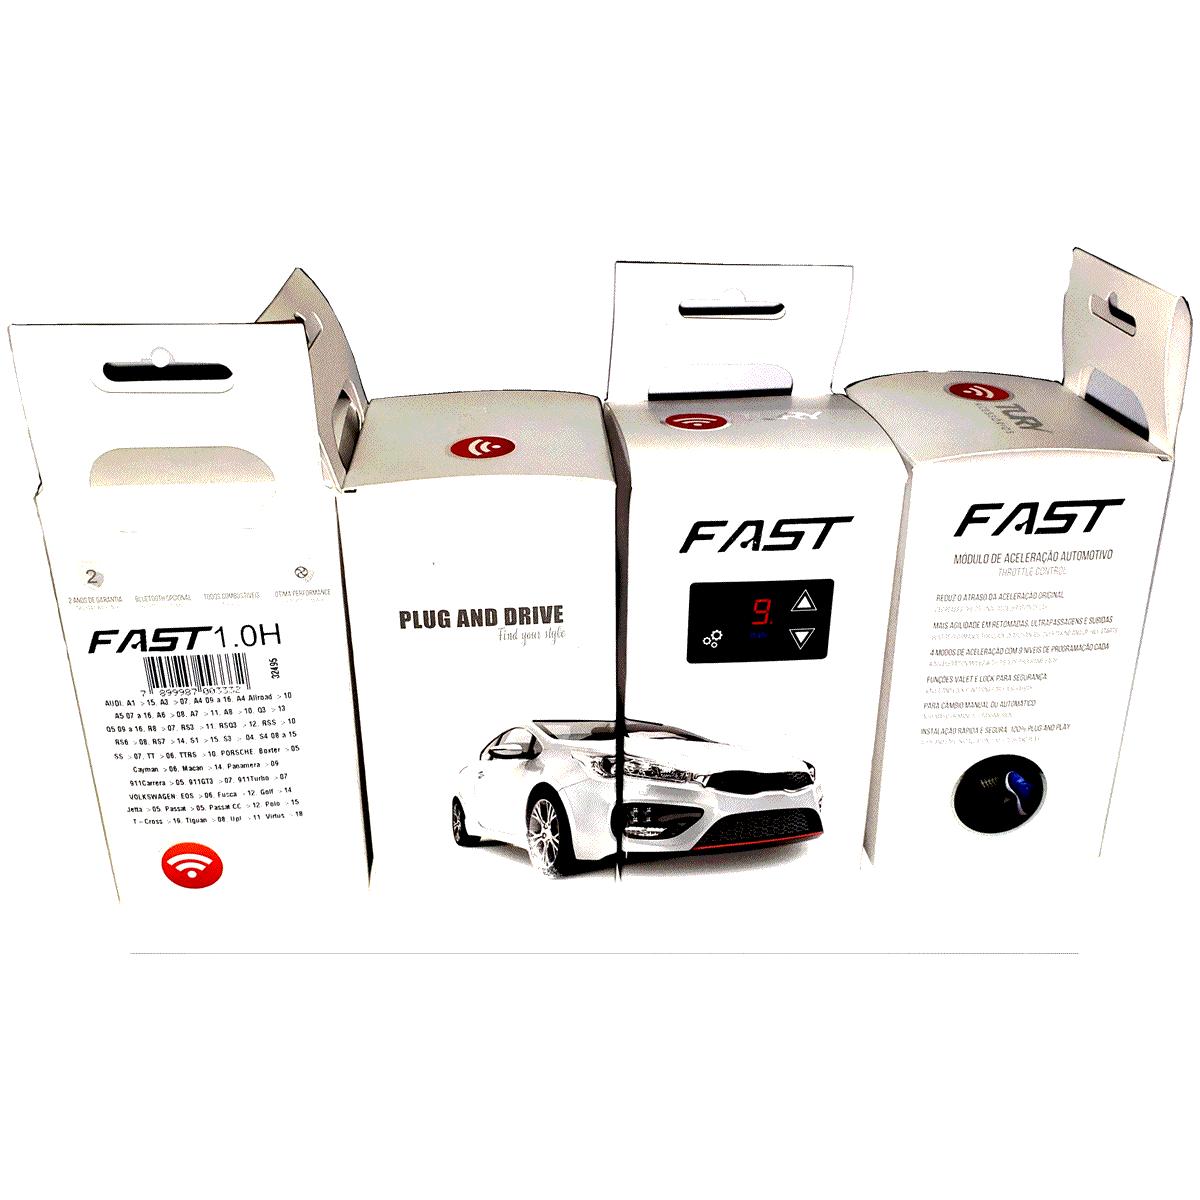 Fast 2.0 AF Kia Picanto Módulo Acelerador Plug & Play